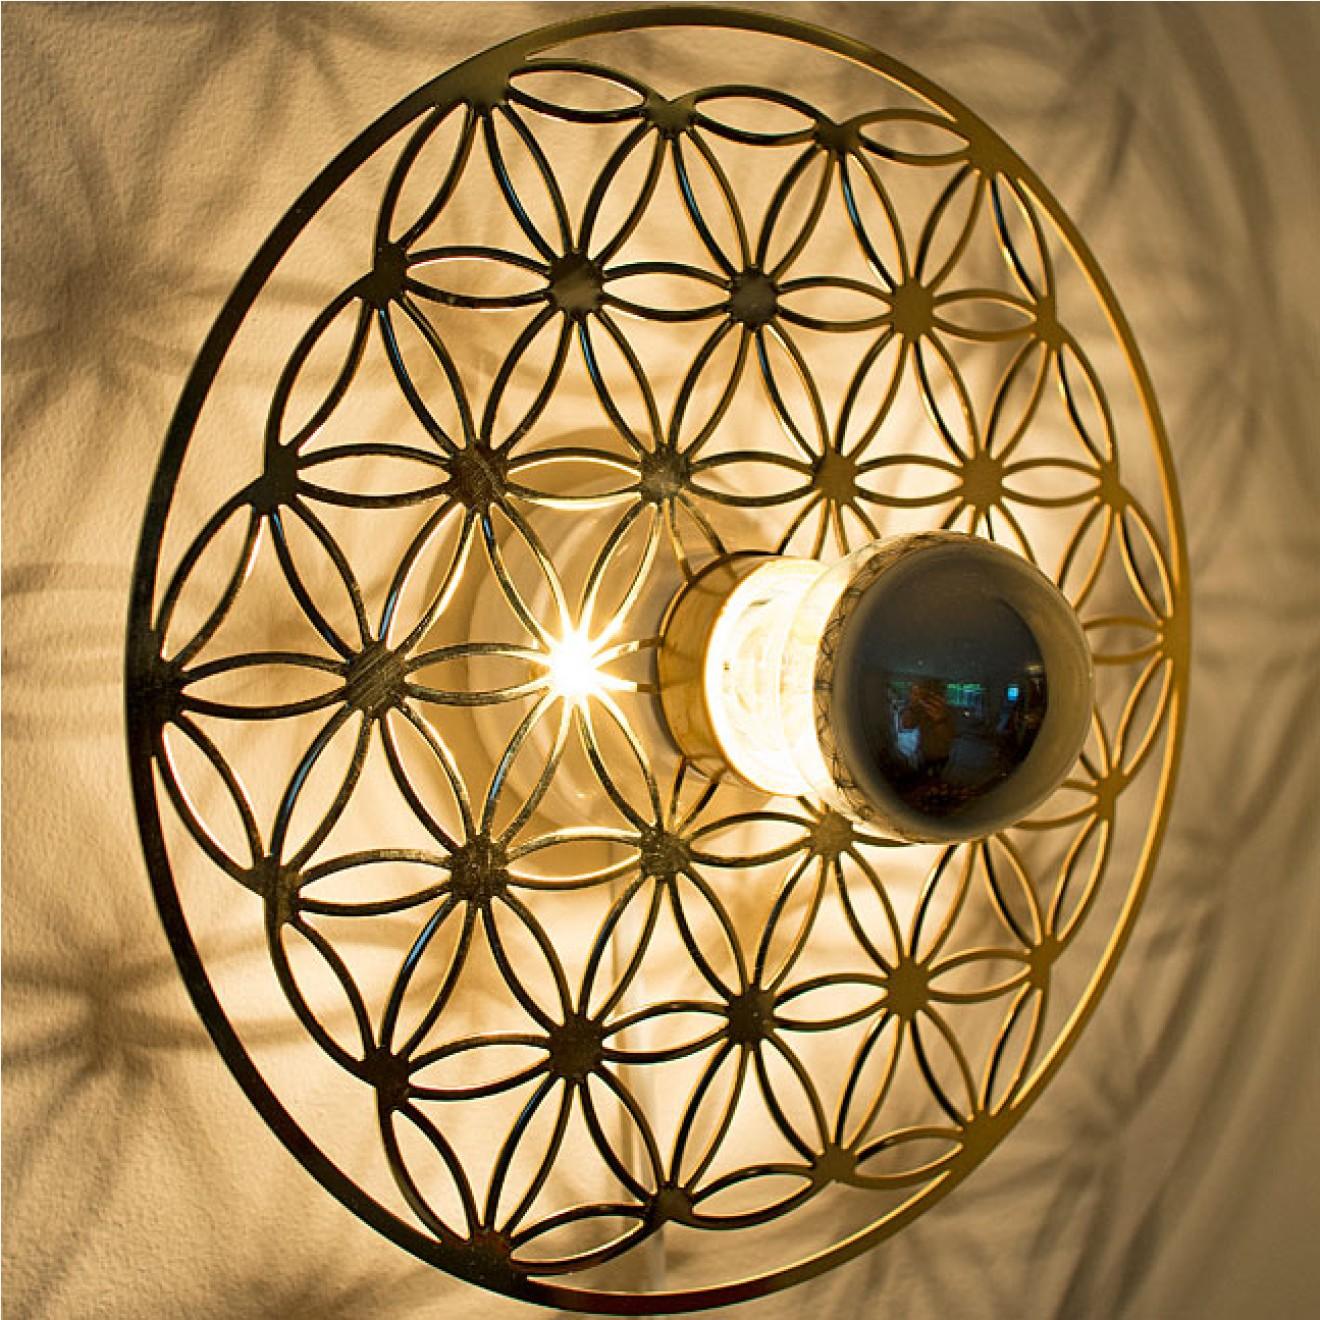 lebensblume lampe gold f r wand decke taolight licht. Black Bedroom Furniture Sets. Home Design Ideas